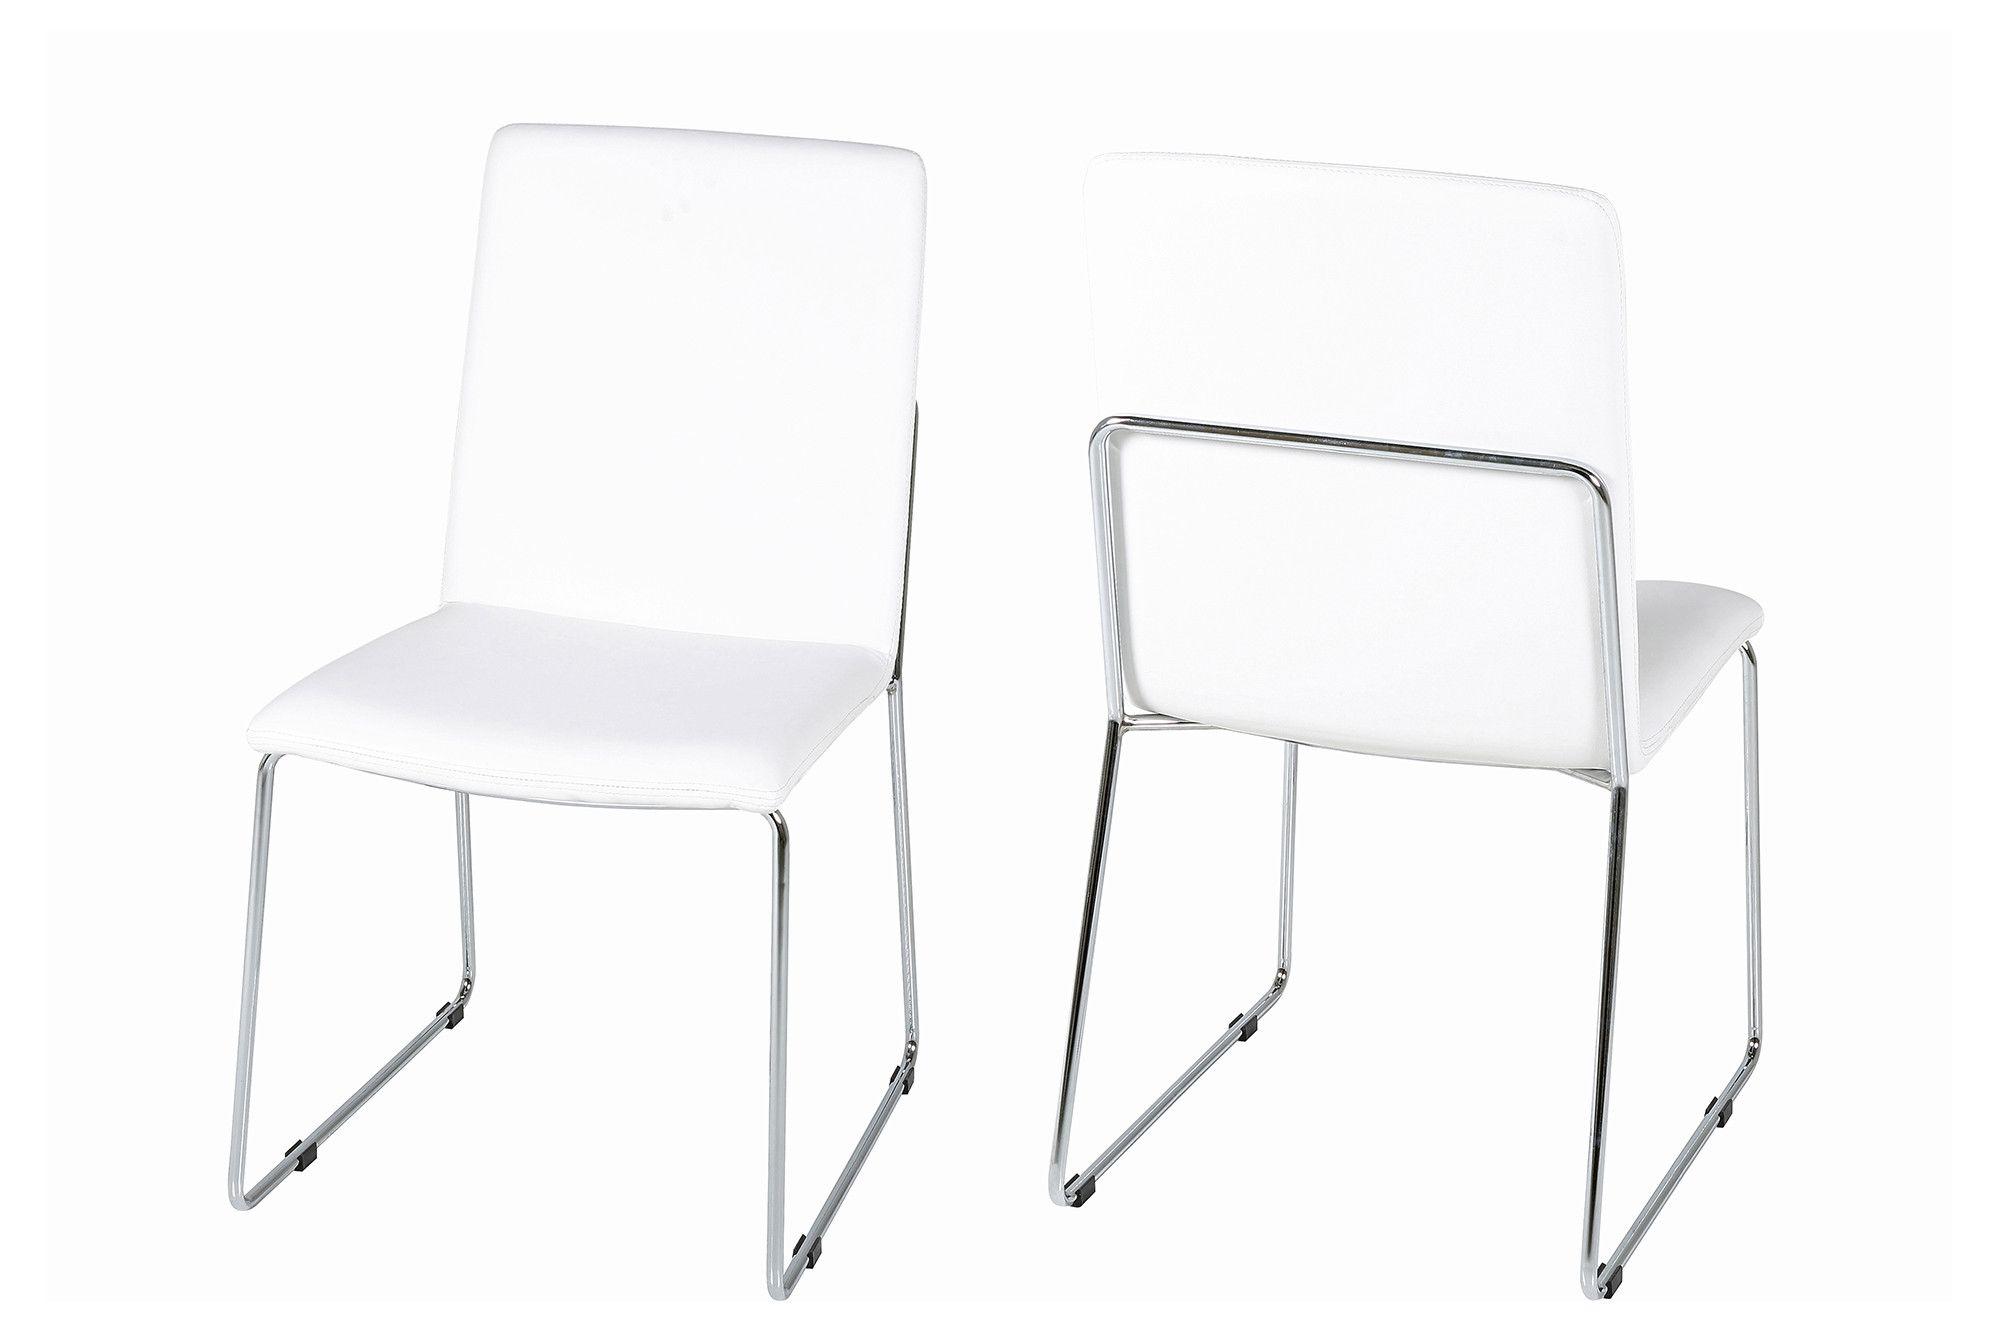 Stuhl 4er Set Kunstleder Weiss Woody 169 00060 Silber Chrom Modern Jetzt Bestellen Unter Https Moebel Ladendirekt De Kue Esszimmerstuhle Stuhle Stuhl Design